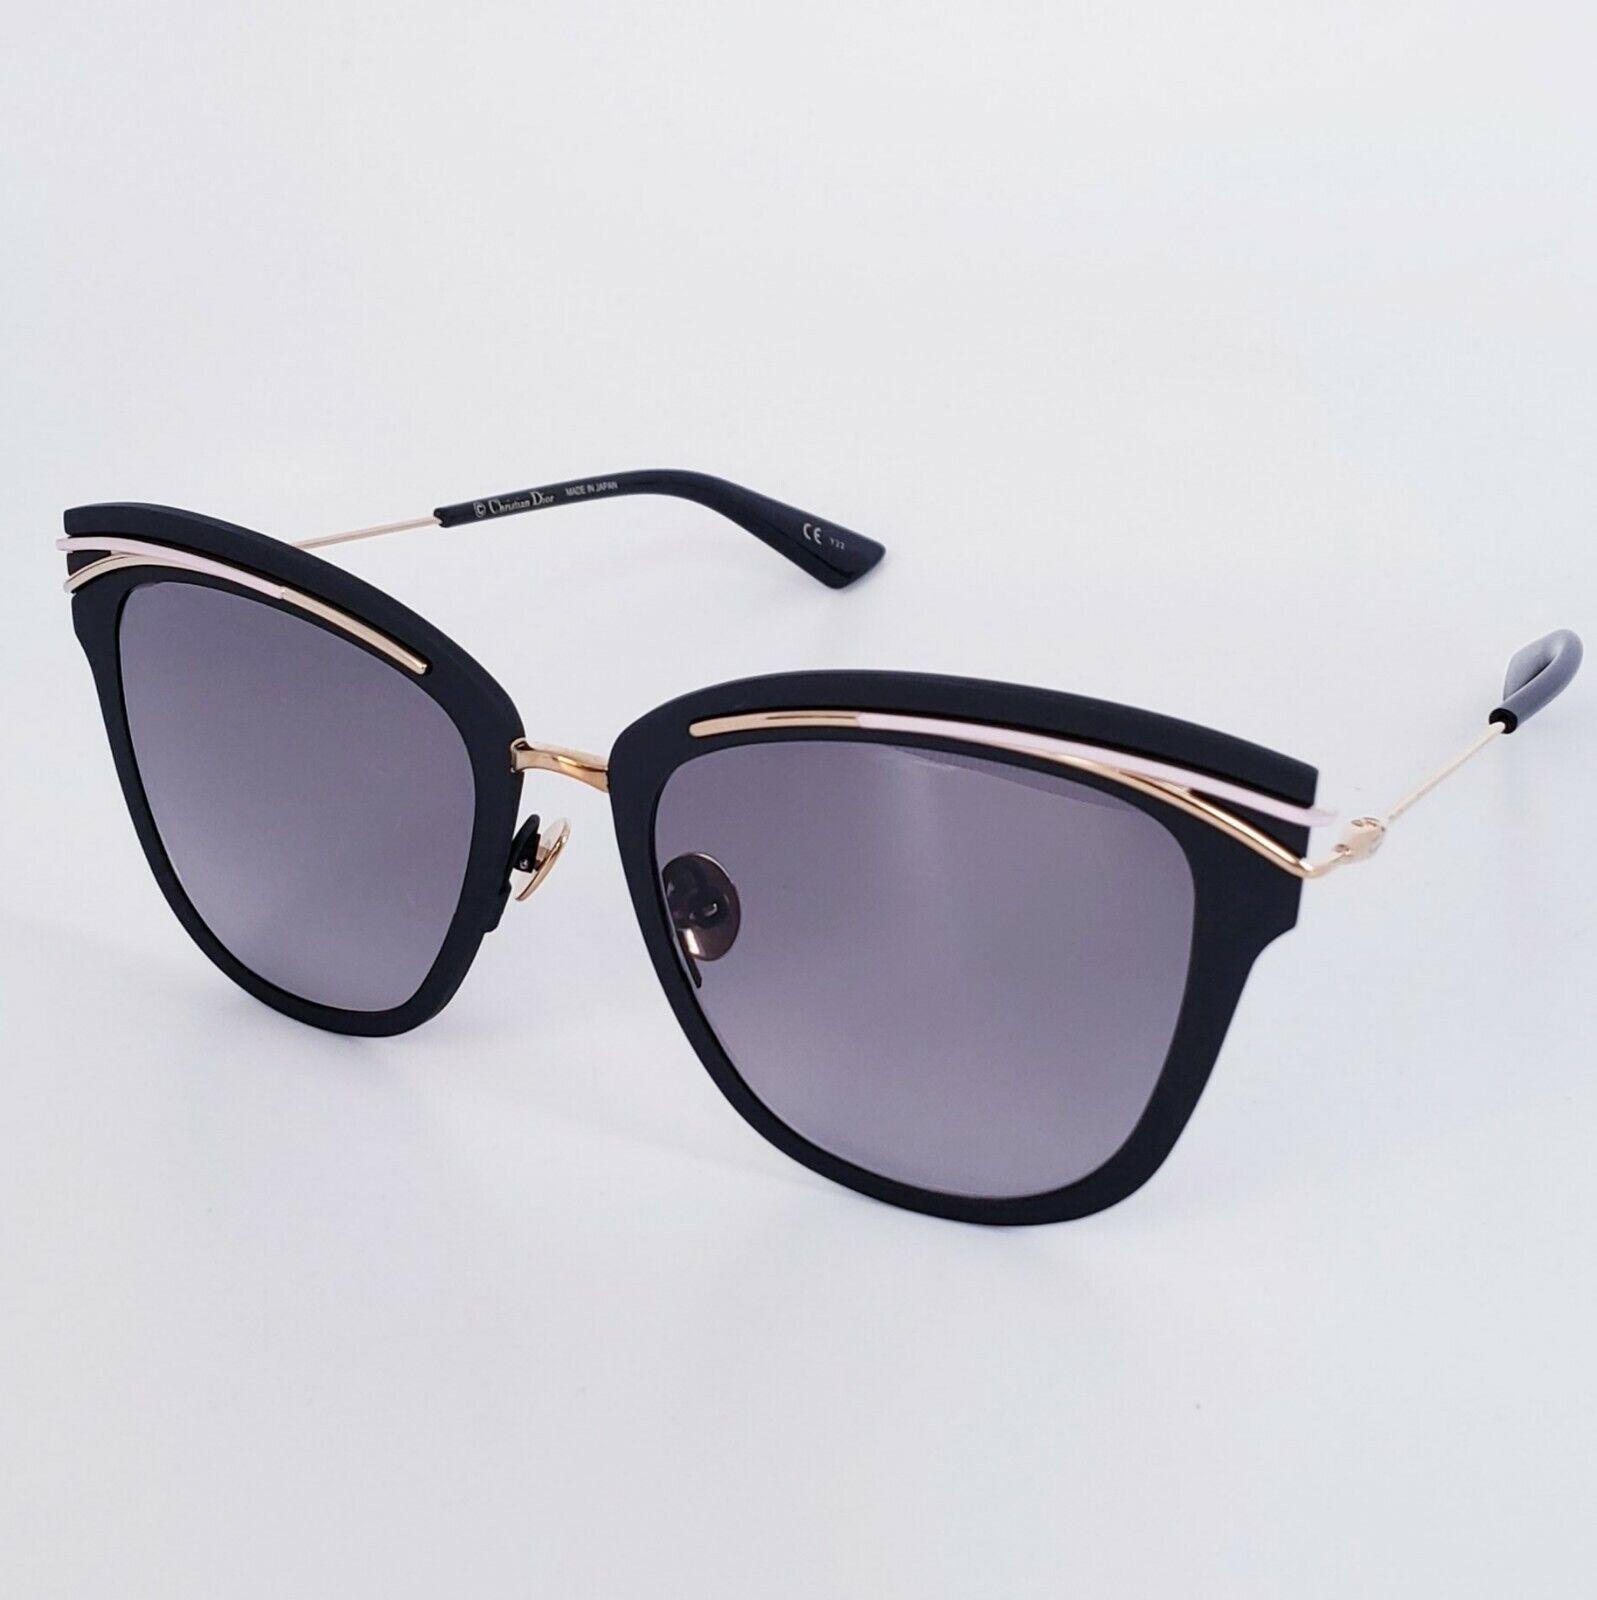 🍀Christian Dior Women's SODIOR YQ/EU Black Gold Pink Titanium Sunglasses 53mm